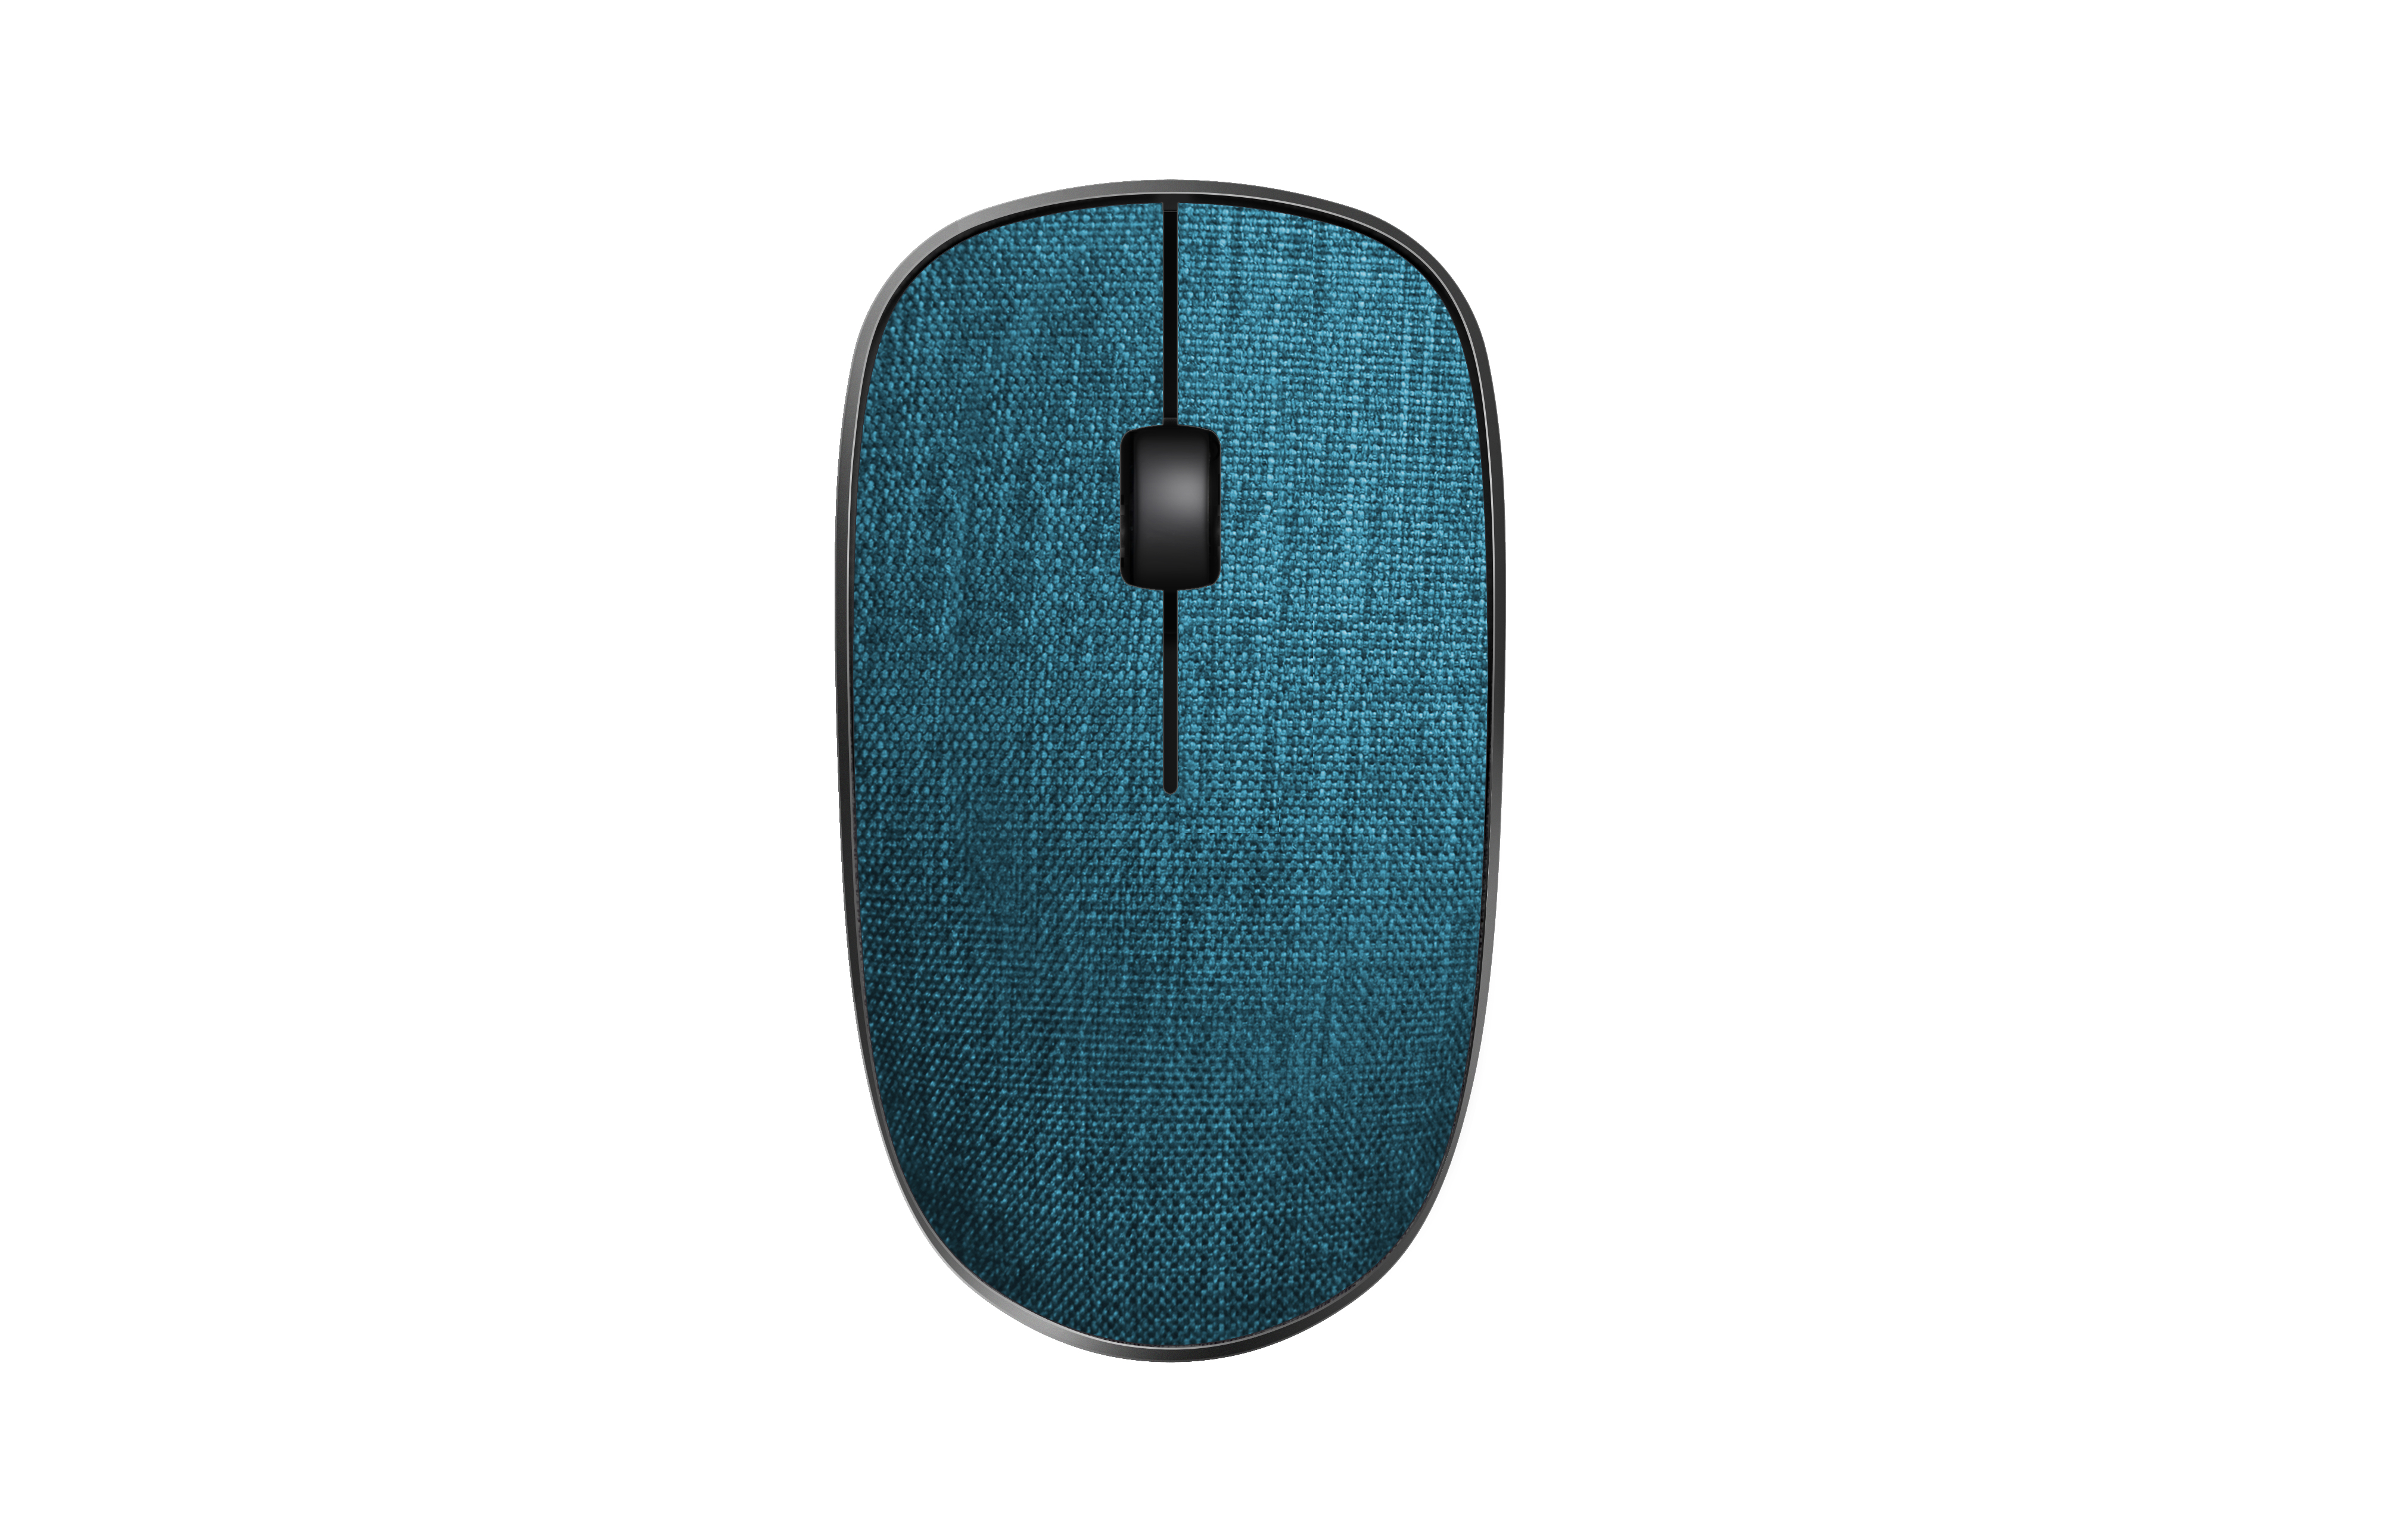 Rapoo Fabric 3510 Plus Blue Wireless Mouse